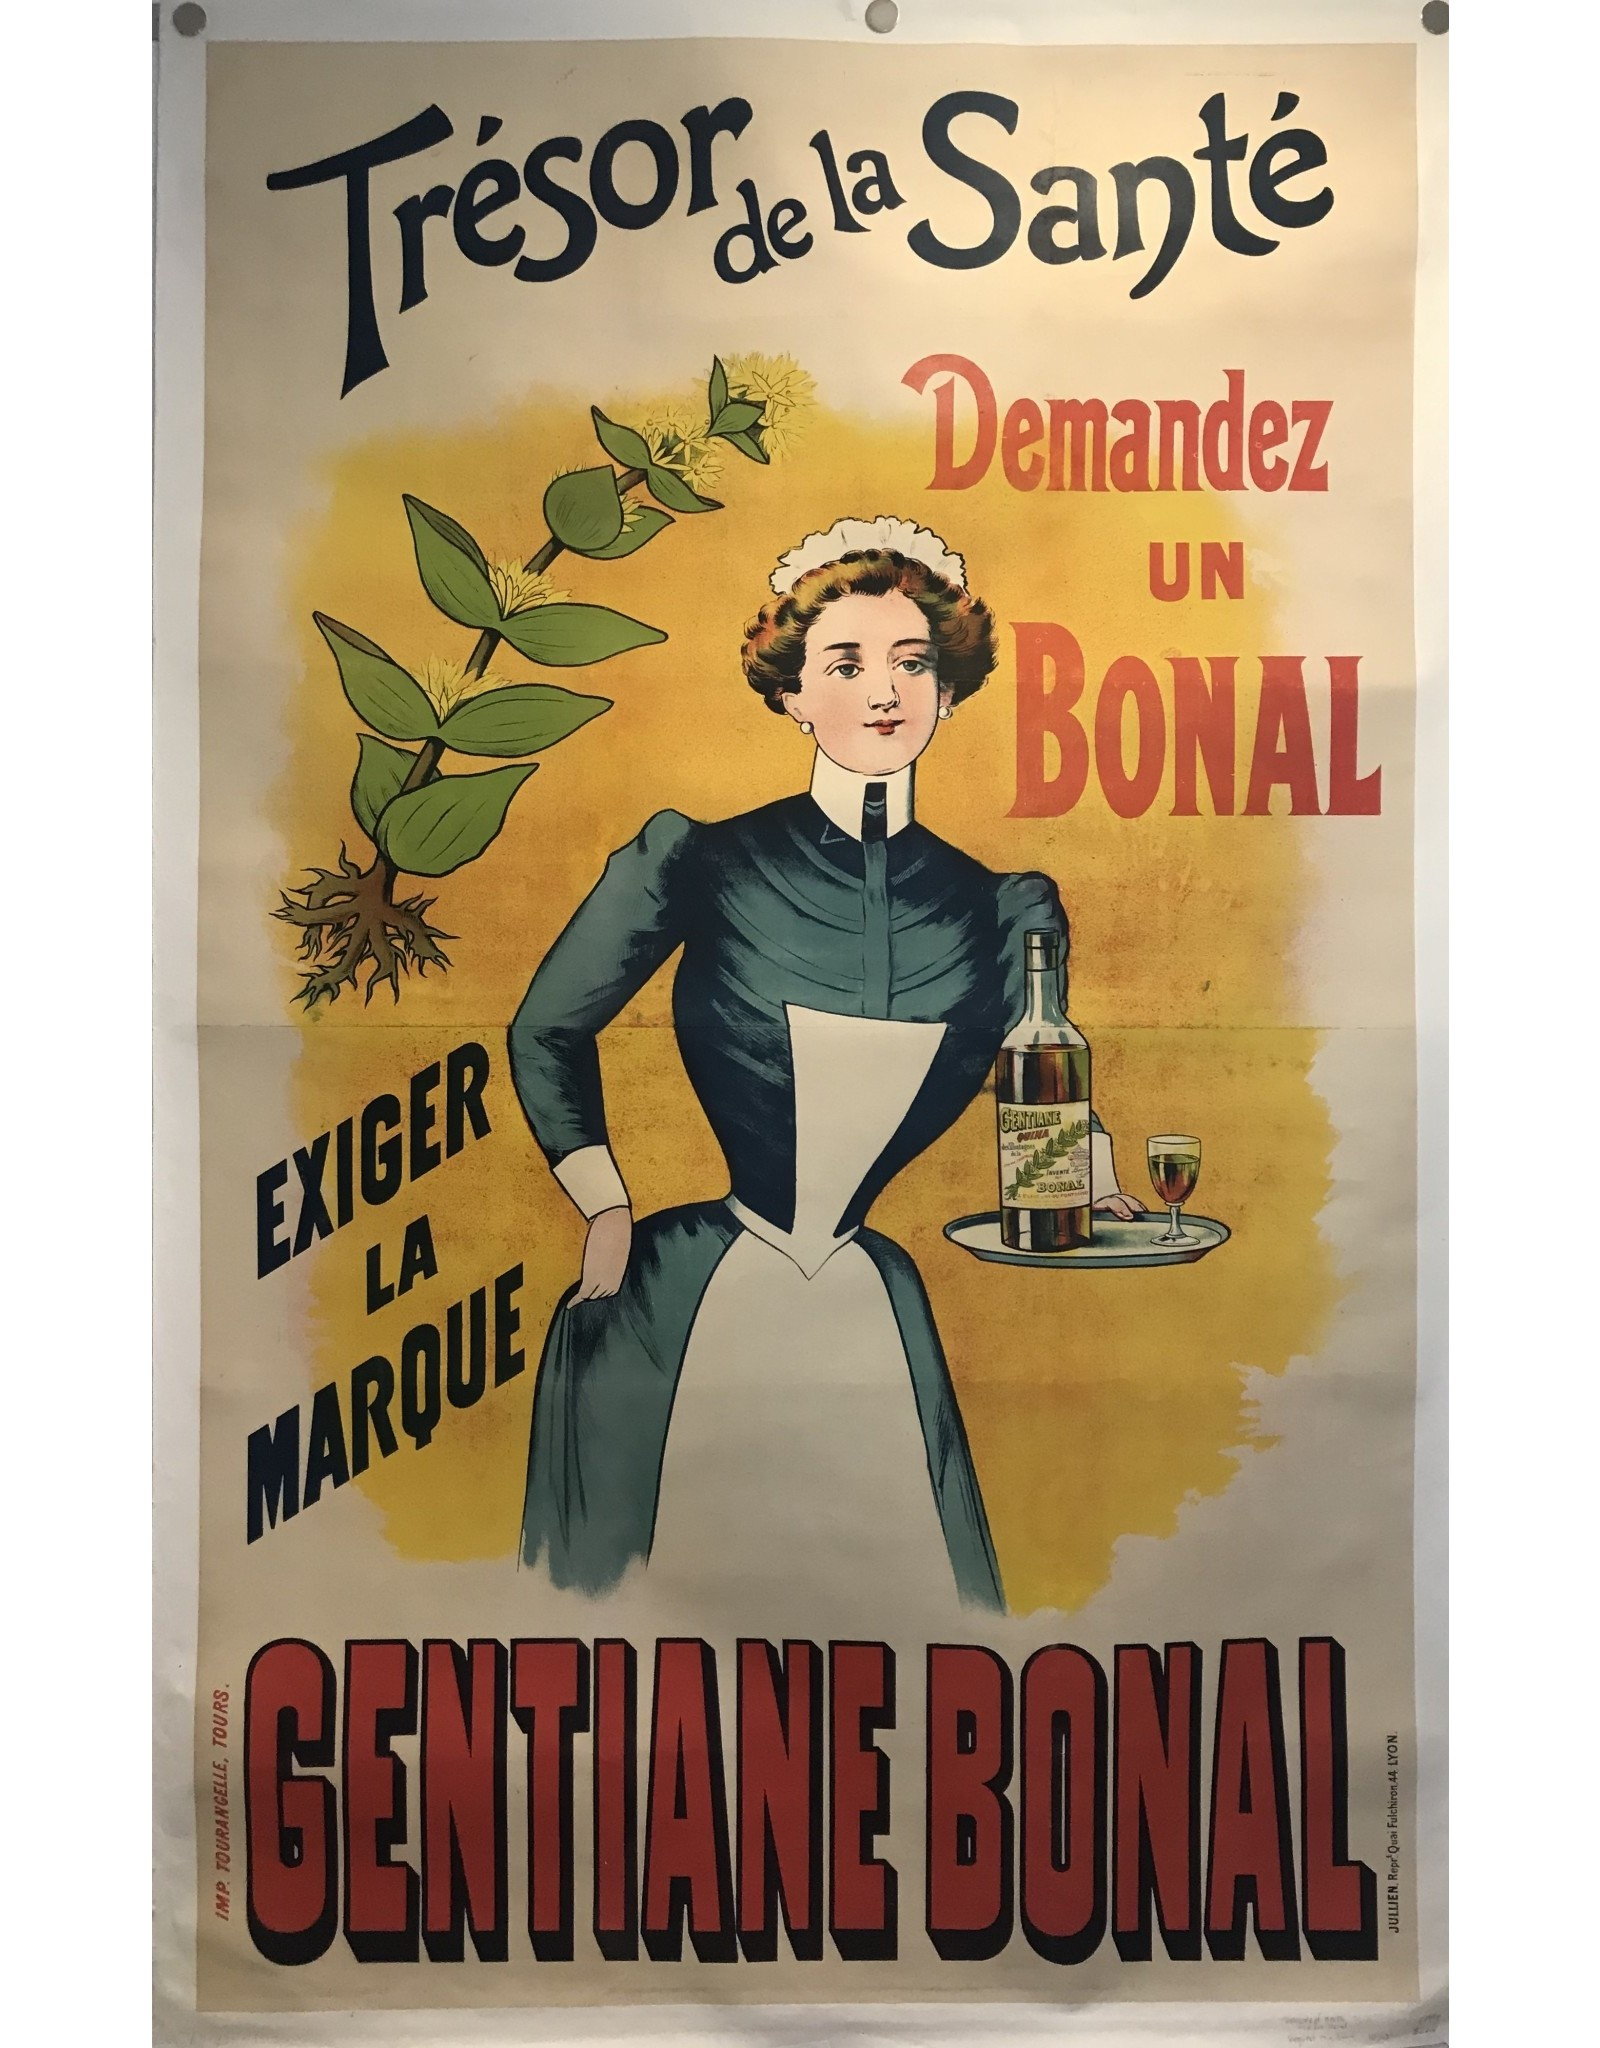 SPV Bonal Poster